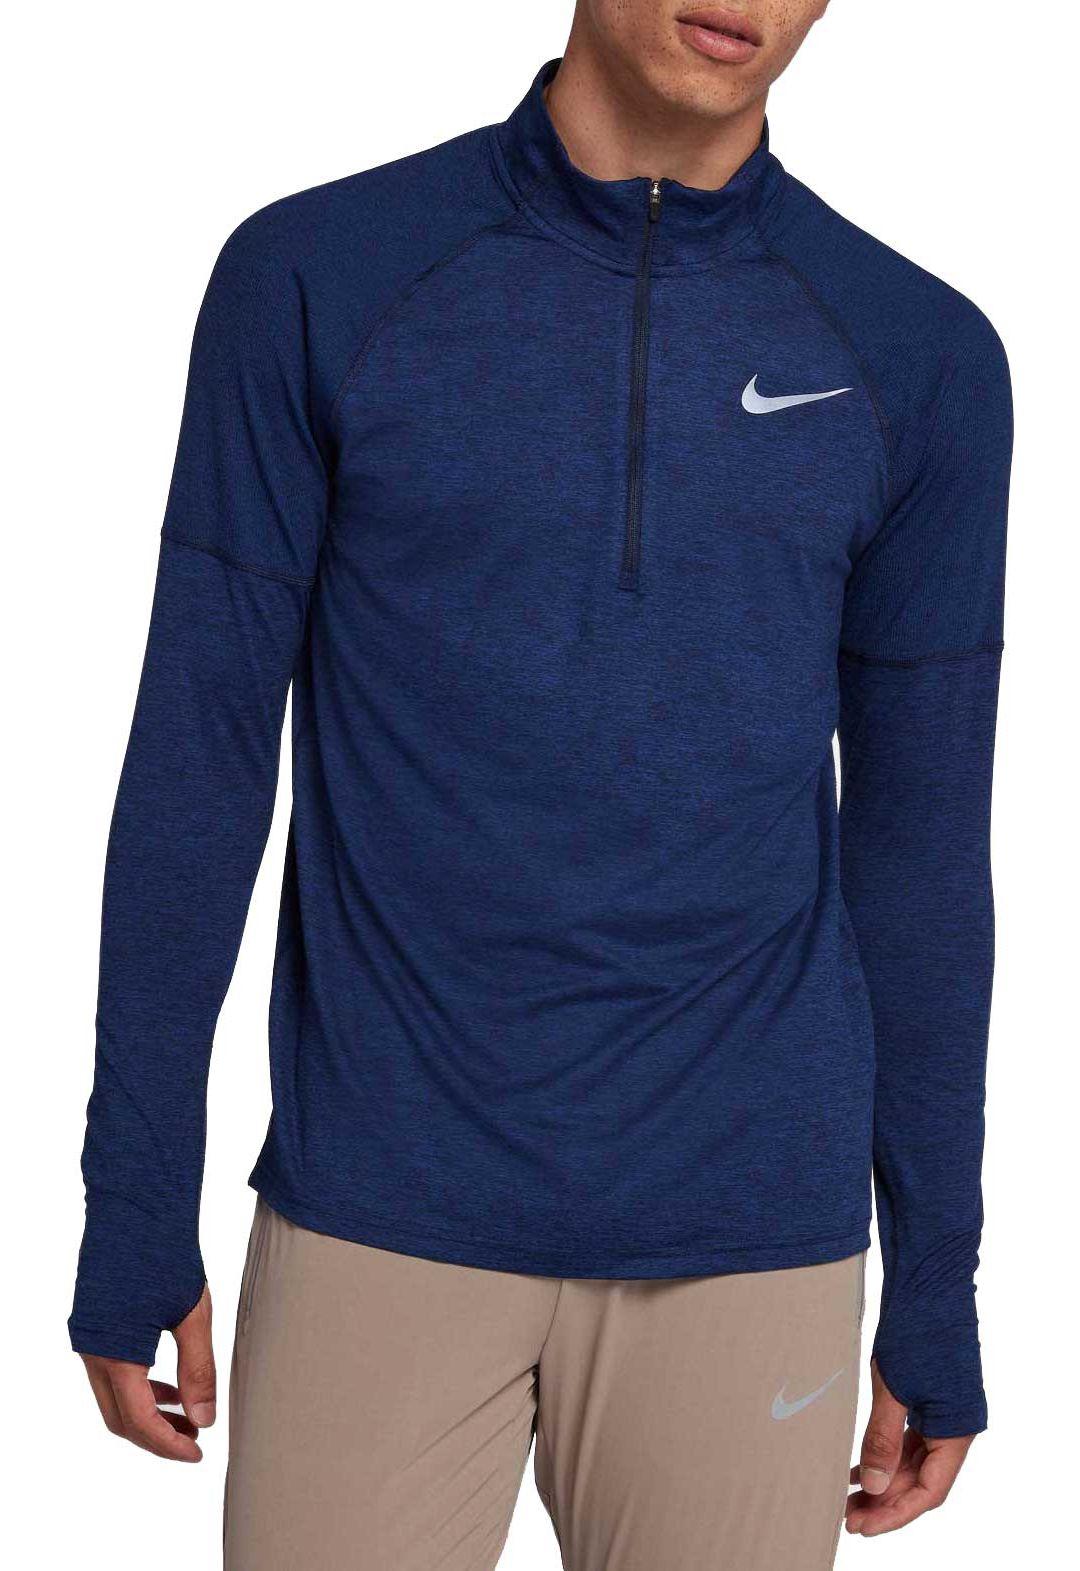 3b47a7229 Nike Men's Element 1/2 Zip Running Shirt   DICK'S Sporting Goods